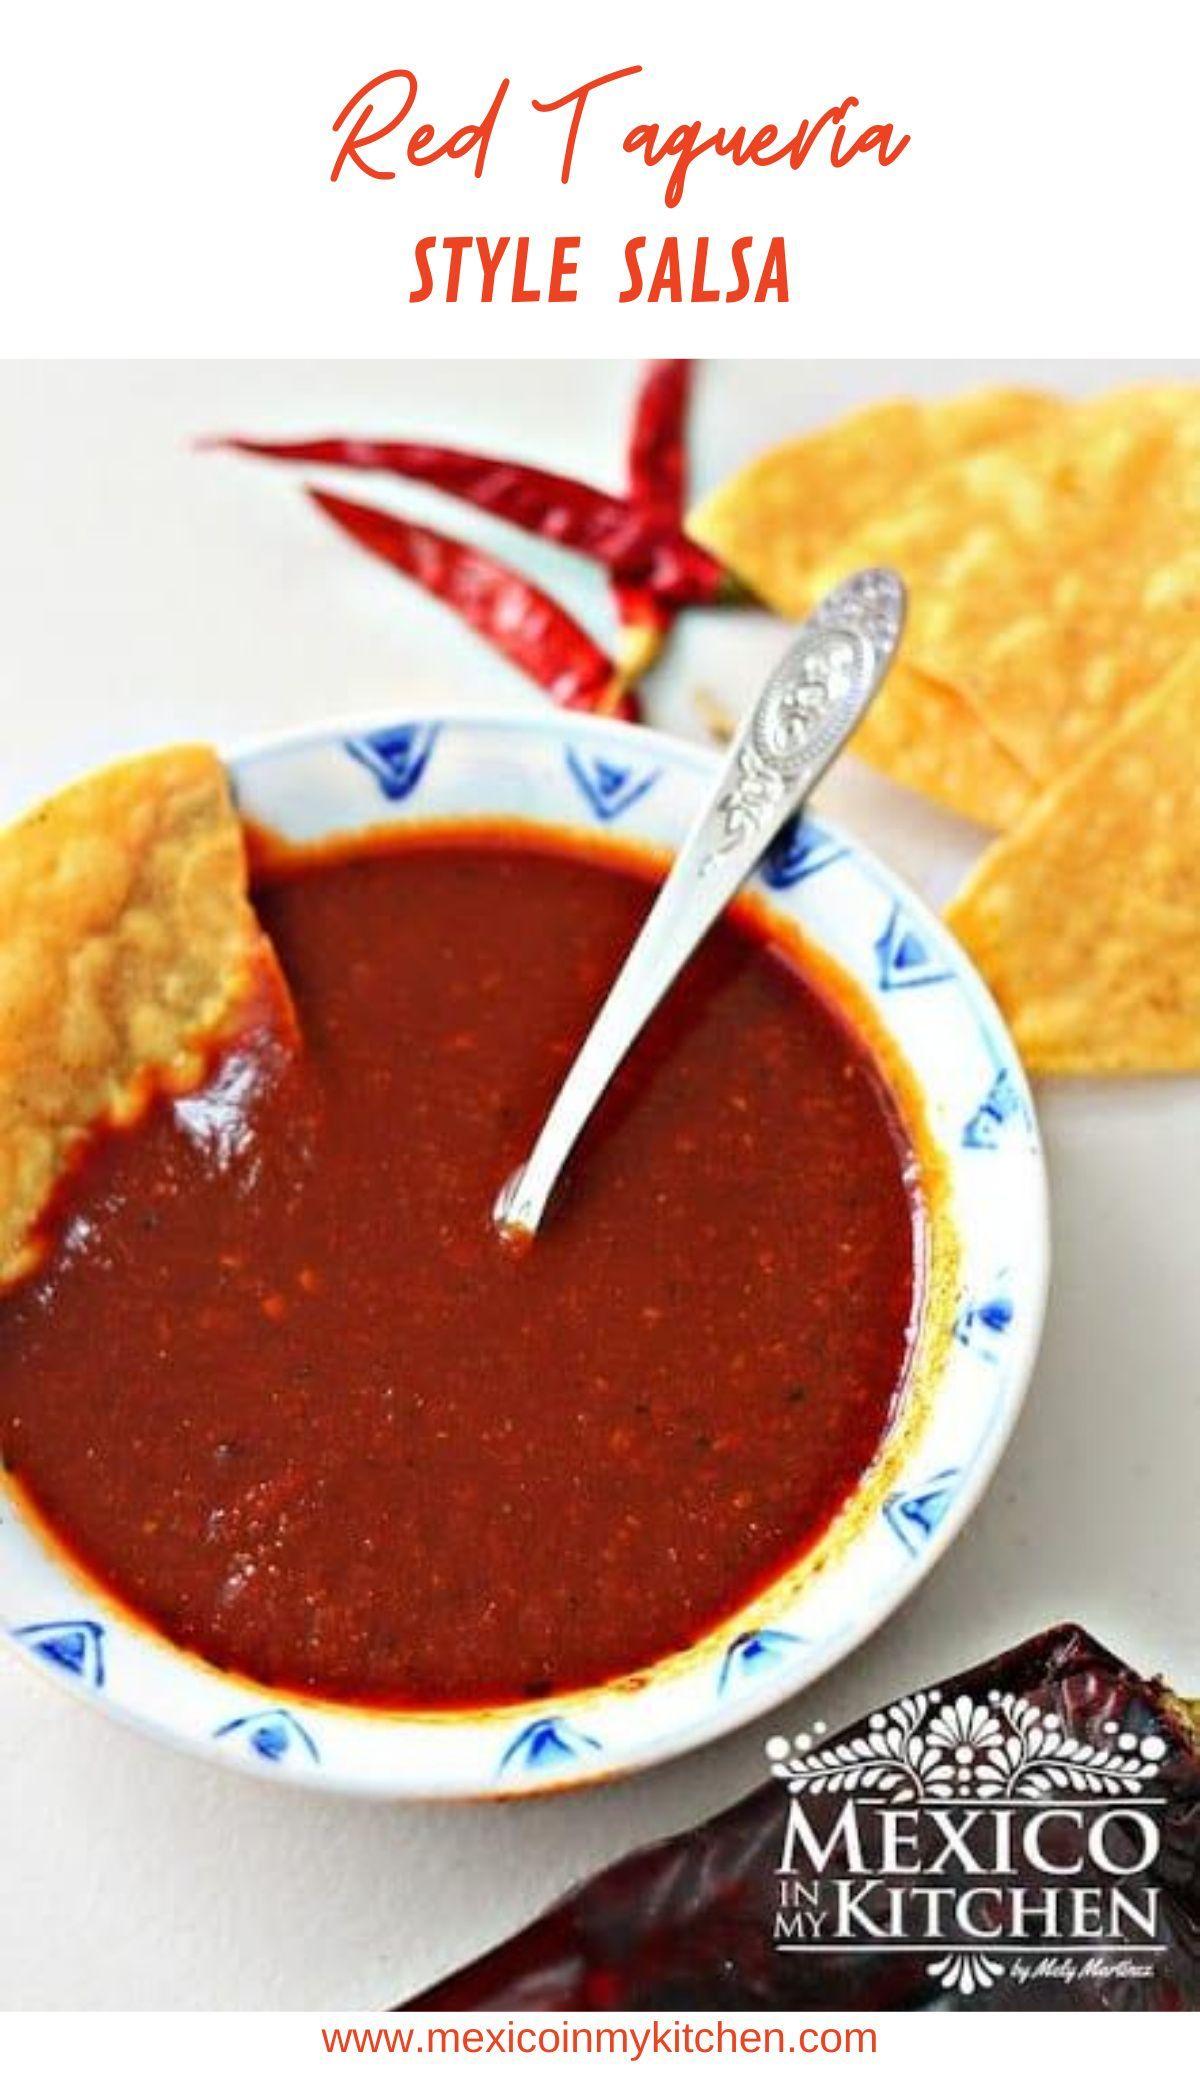 Red Taquería Style Salsa Receta De Salsa Taquera Mexican Recipes Recipe Mexican Food Recipes New Chicken Recipes Pork Carnitas Tacos